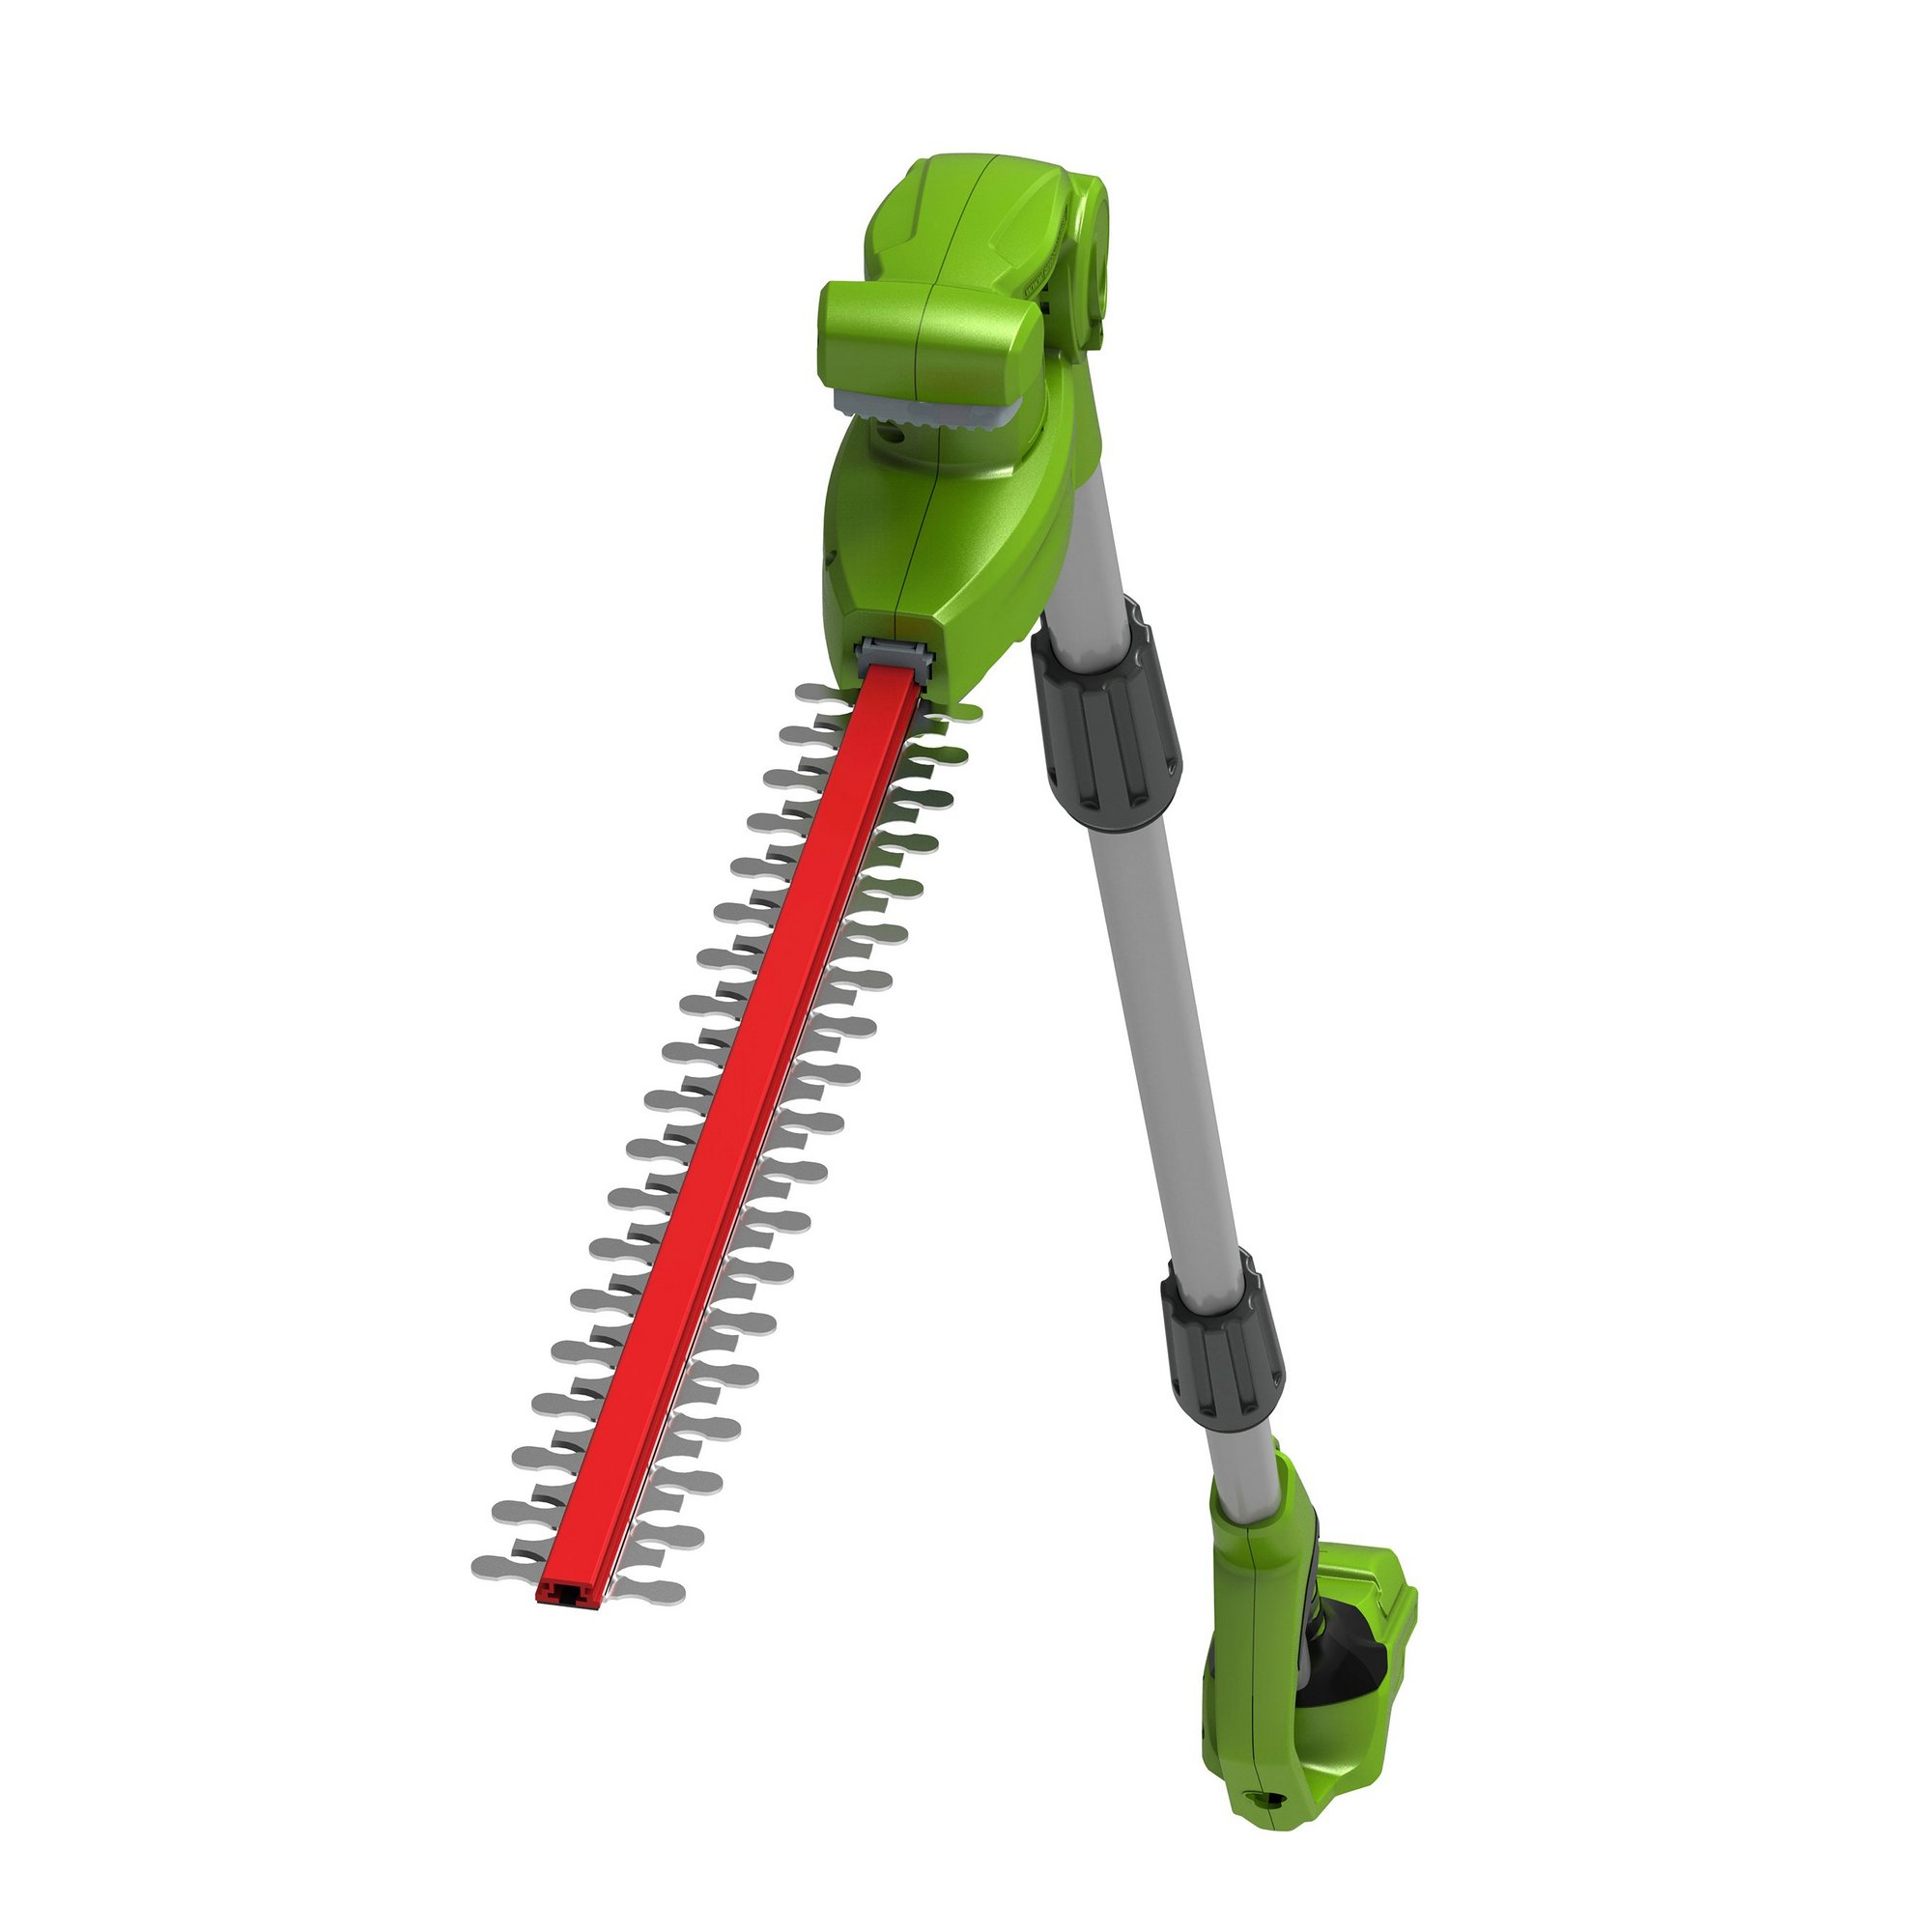 Image of Greenworks 51cm Long Reach Cordless Split Shaft Hedge Trimmer (To...